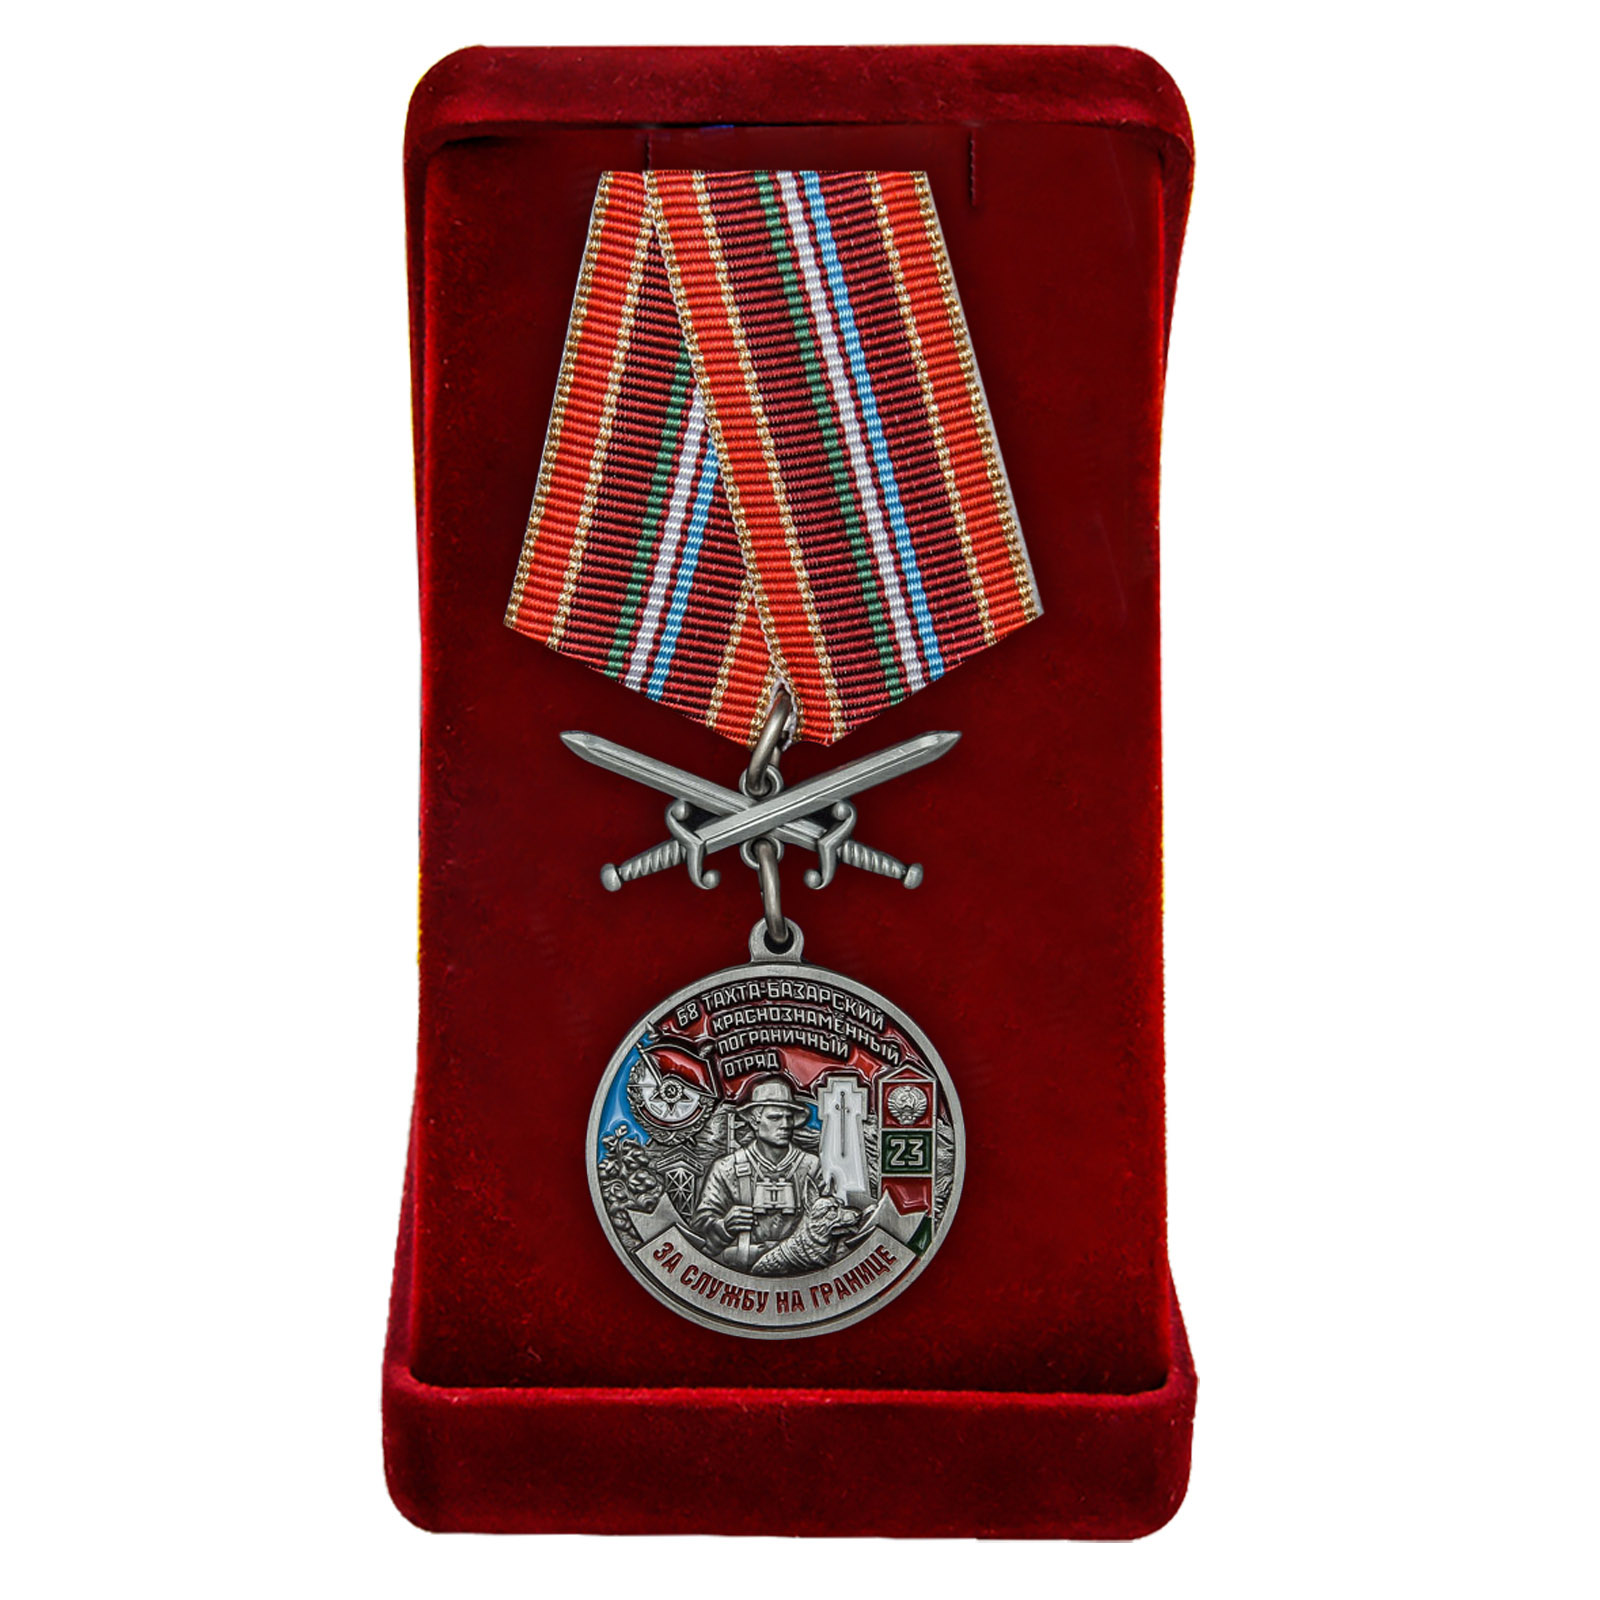 Купить медаль За службу на границе (68 Тахта-Базарский ПогО) в подарок